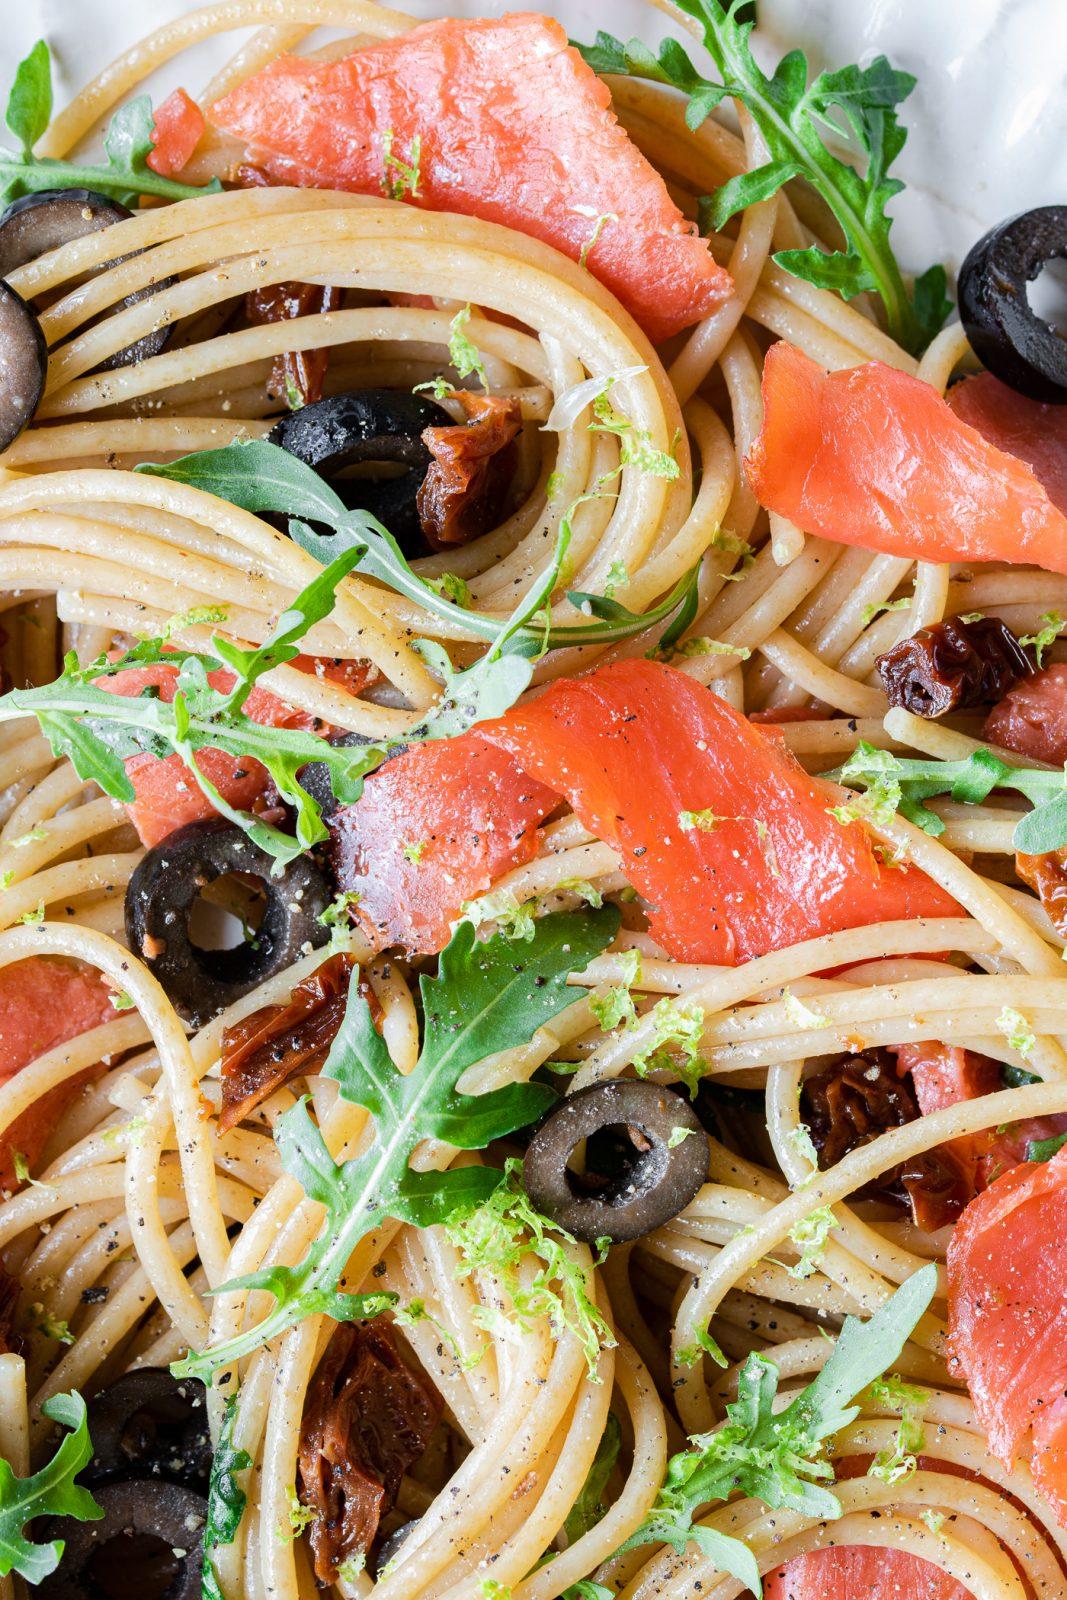 Pasta al salmone affumicato senza panna con rucola lime e olive